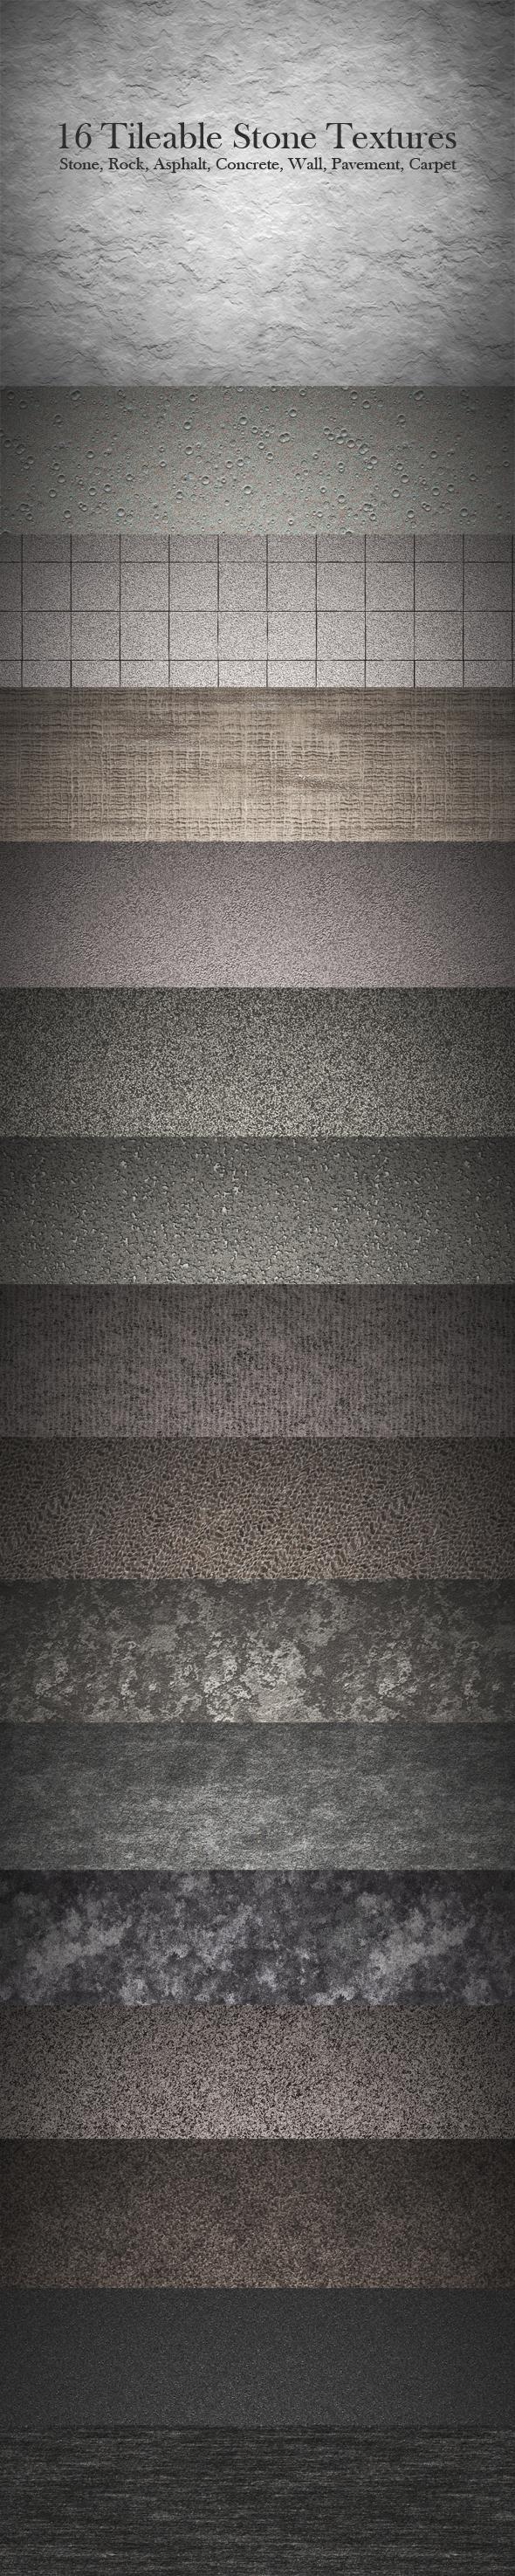 16 Tileable Stone Textures